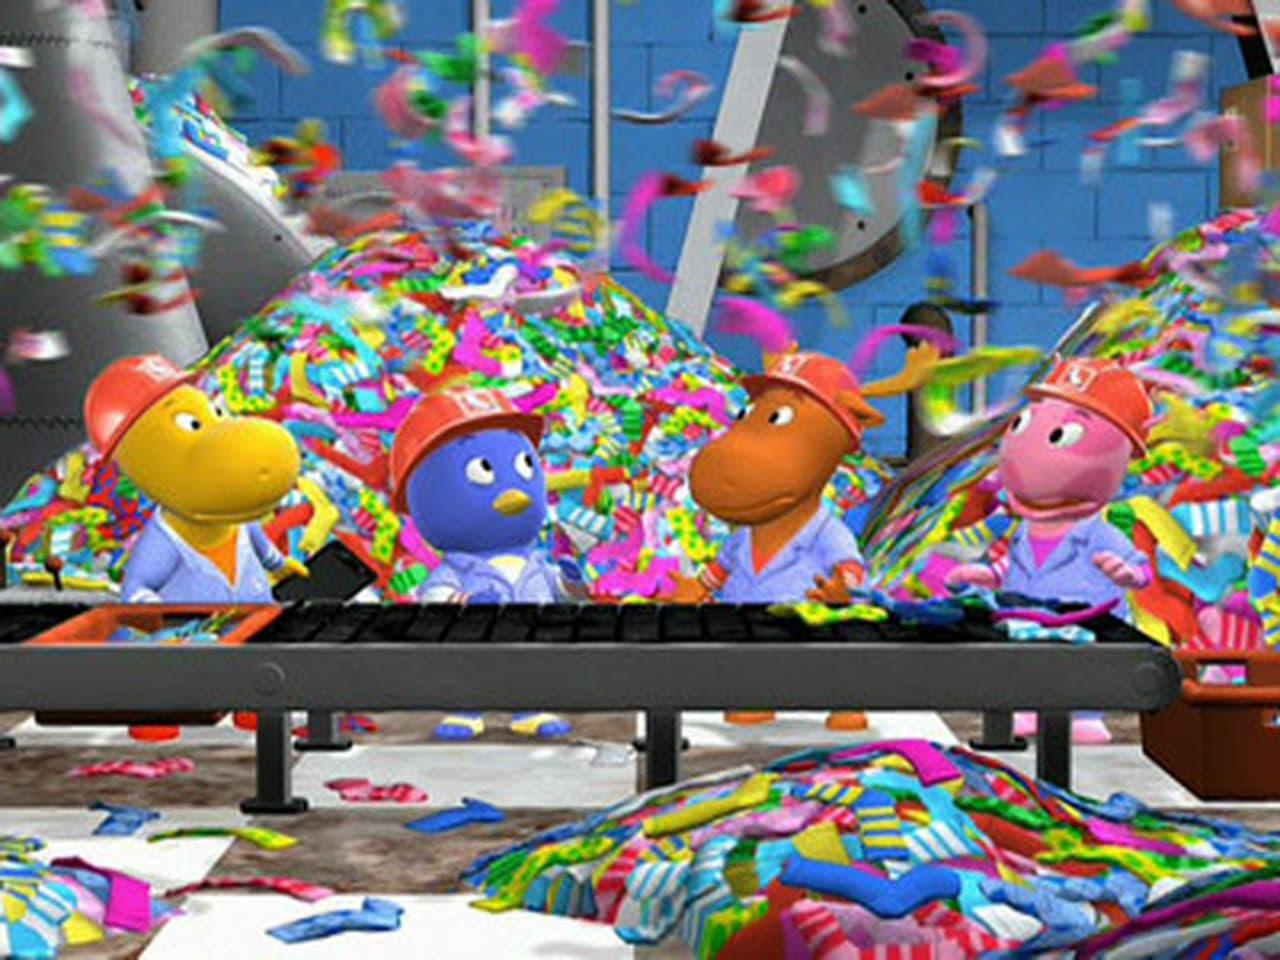 The Backyardigans Episode: The Magic Skateboard